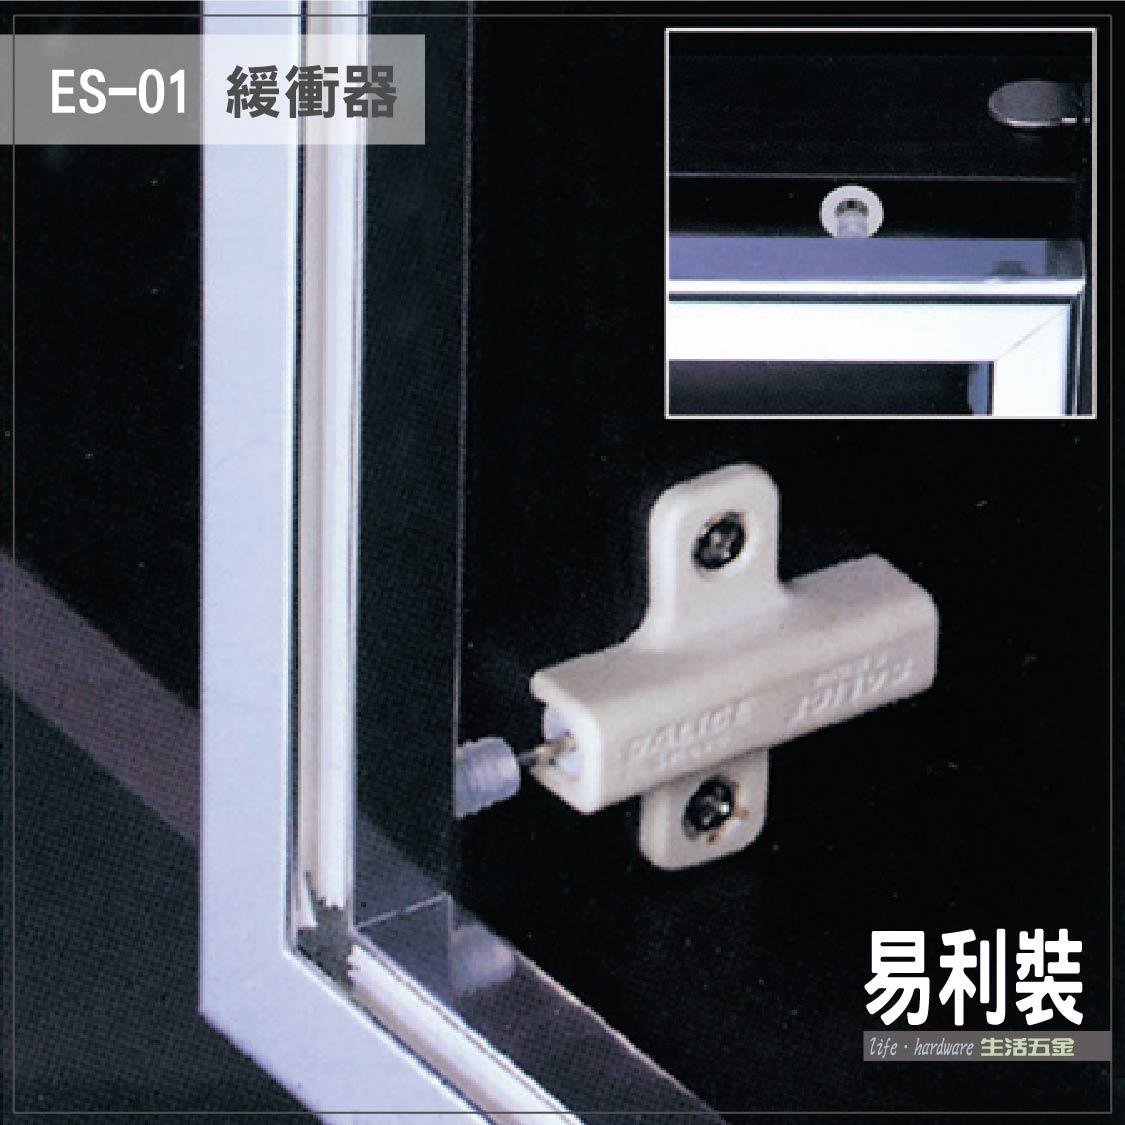 【 EASYCAN  】ES 緩衝器 易利裝生活五金 門片 房間 臥房 客廳 餐廳 櫥櫃 衣櫃 小資族 辦公家具 系統家具 1